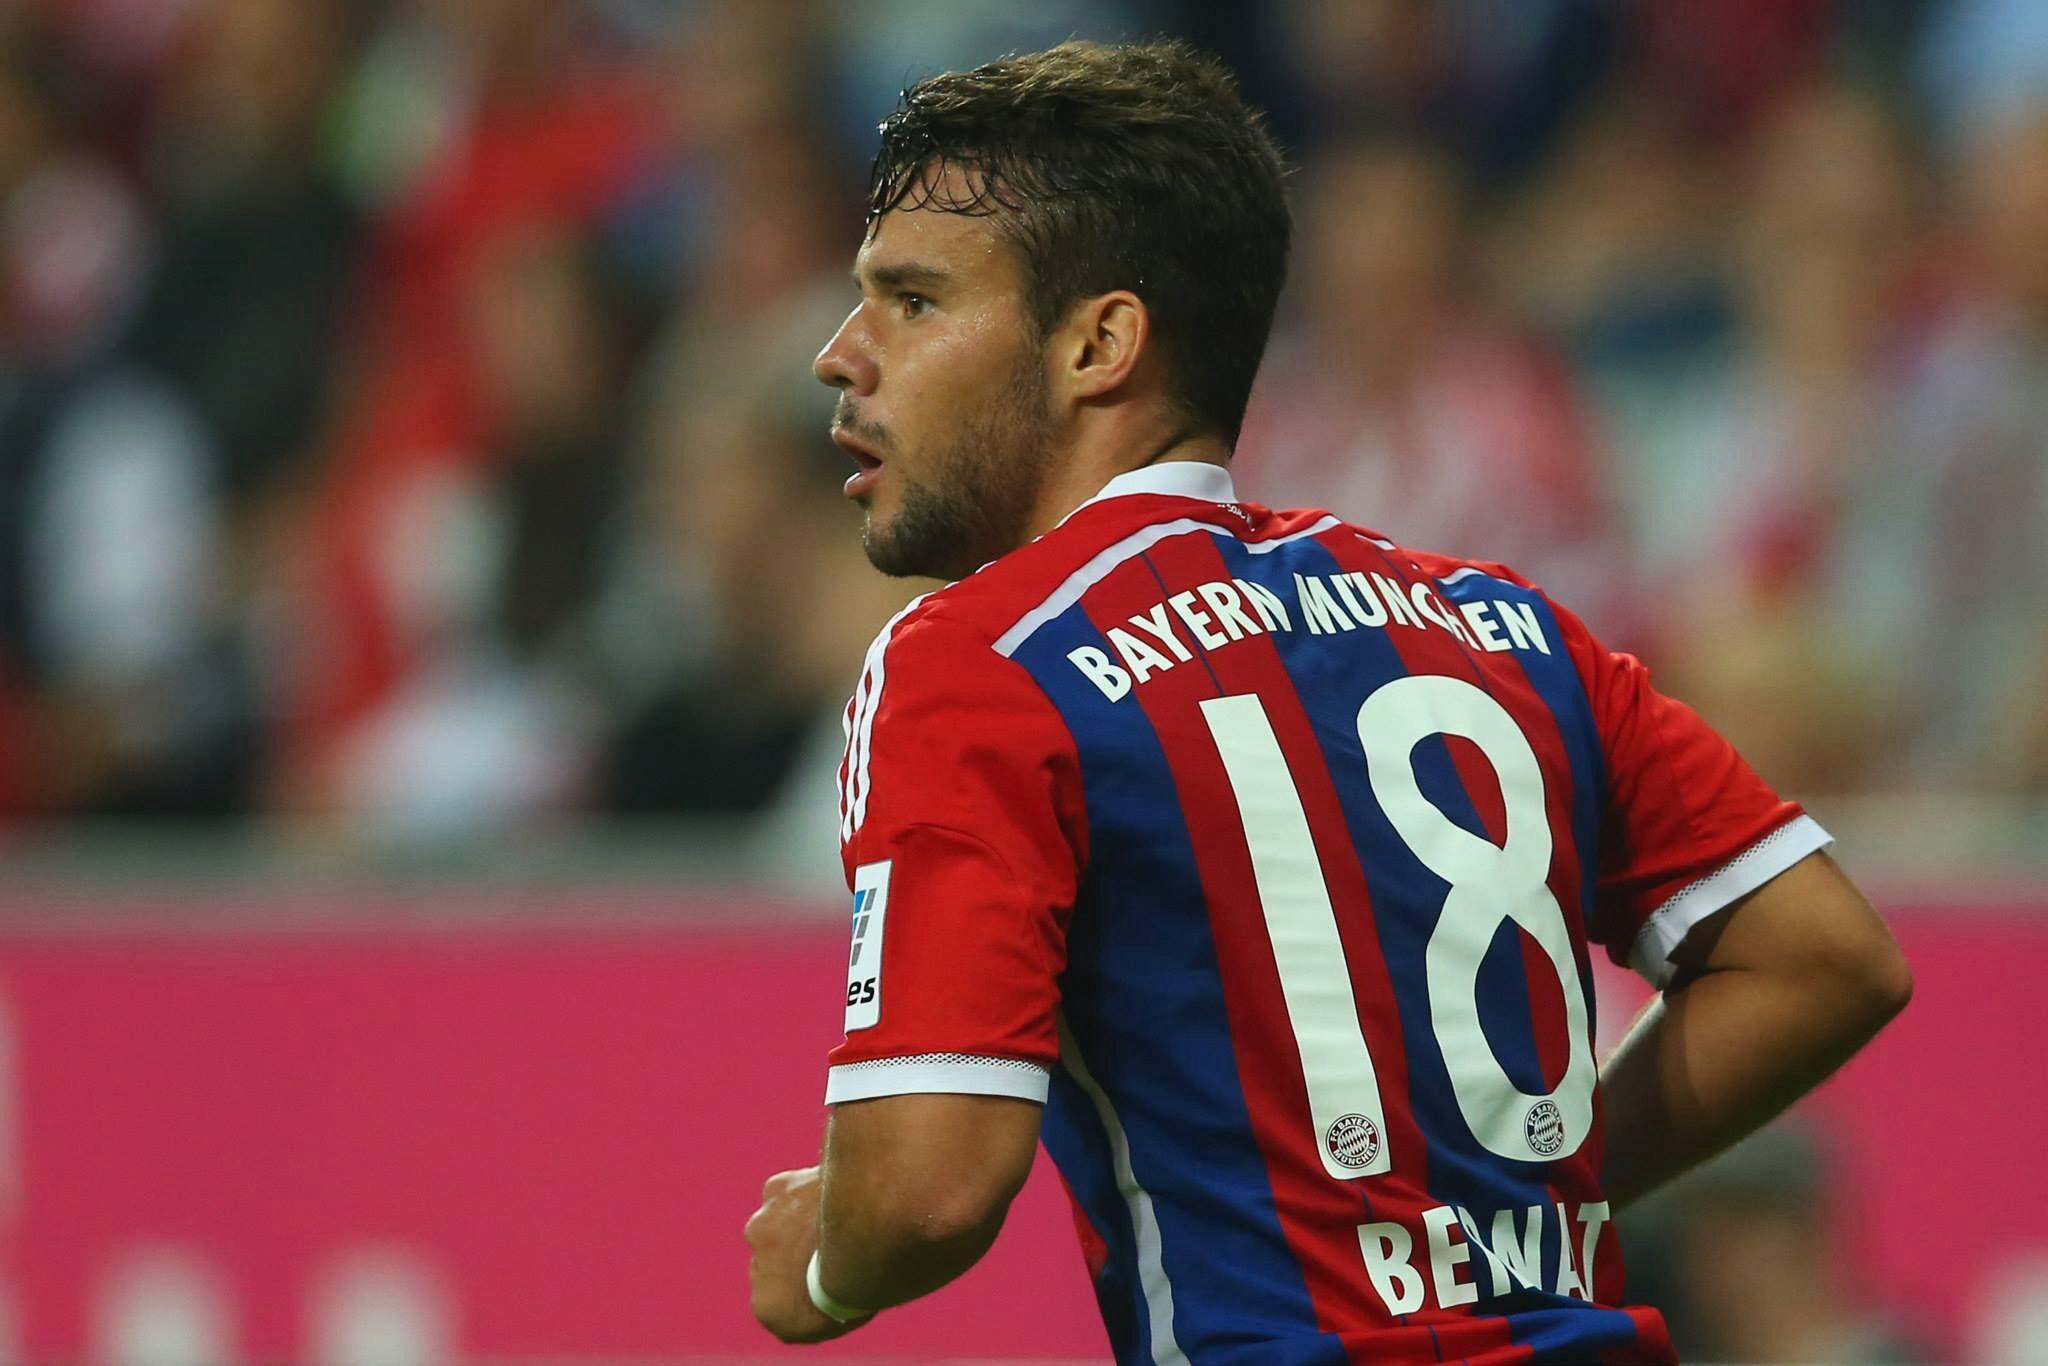 Bernat makes his Bundesliga debut for Bayern. Willkommen! Bayern vs Wolfsburg 22.08.14